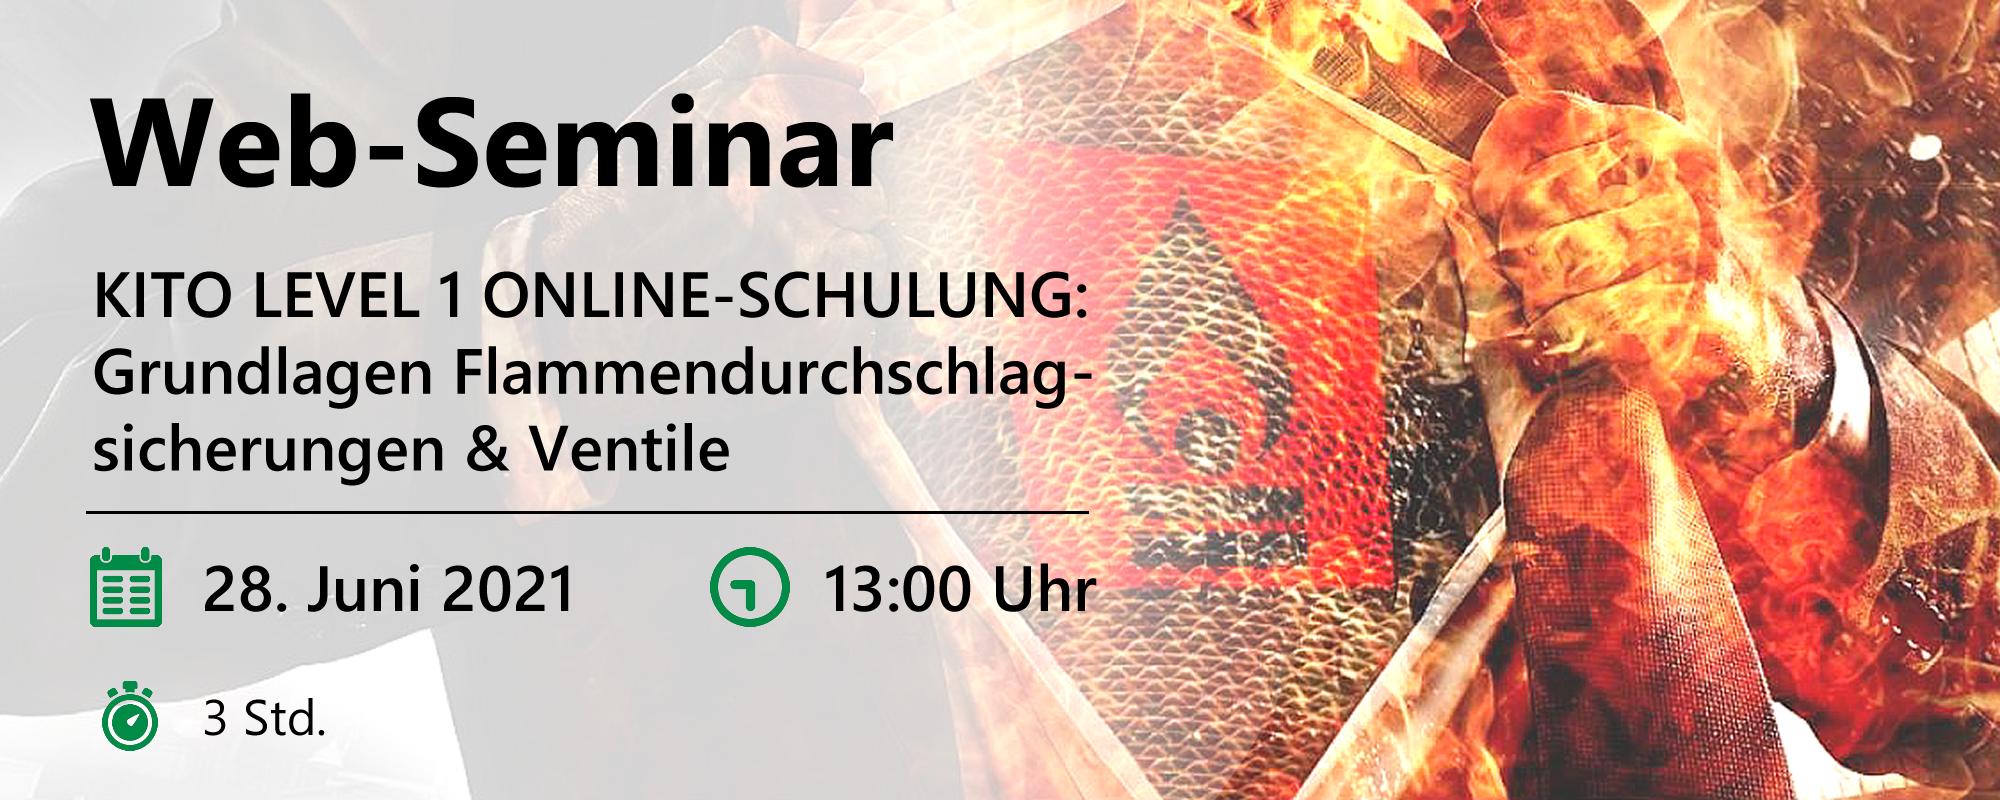 Web-Seminar am 28.06.2021